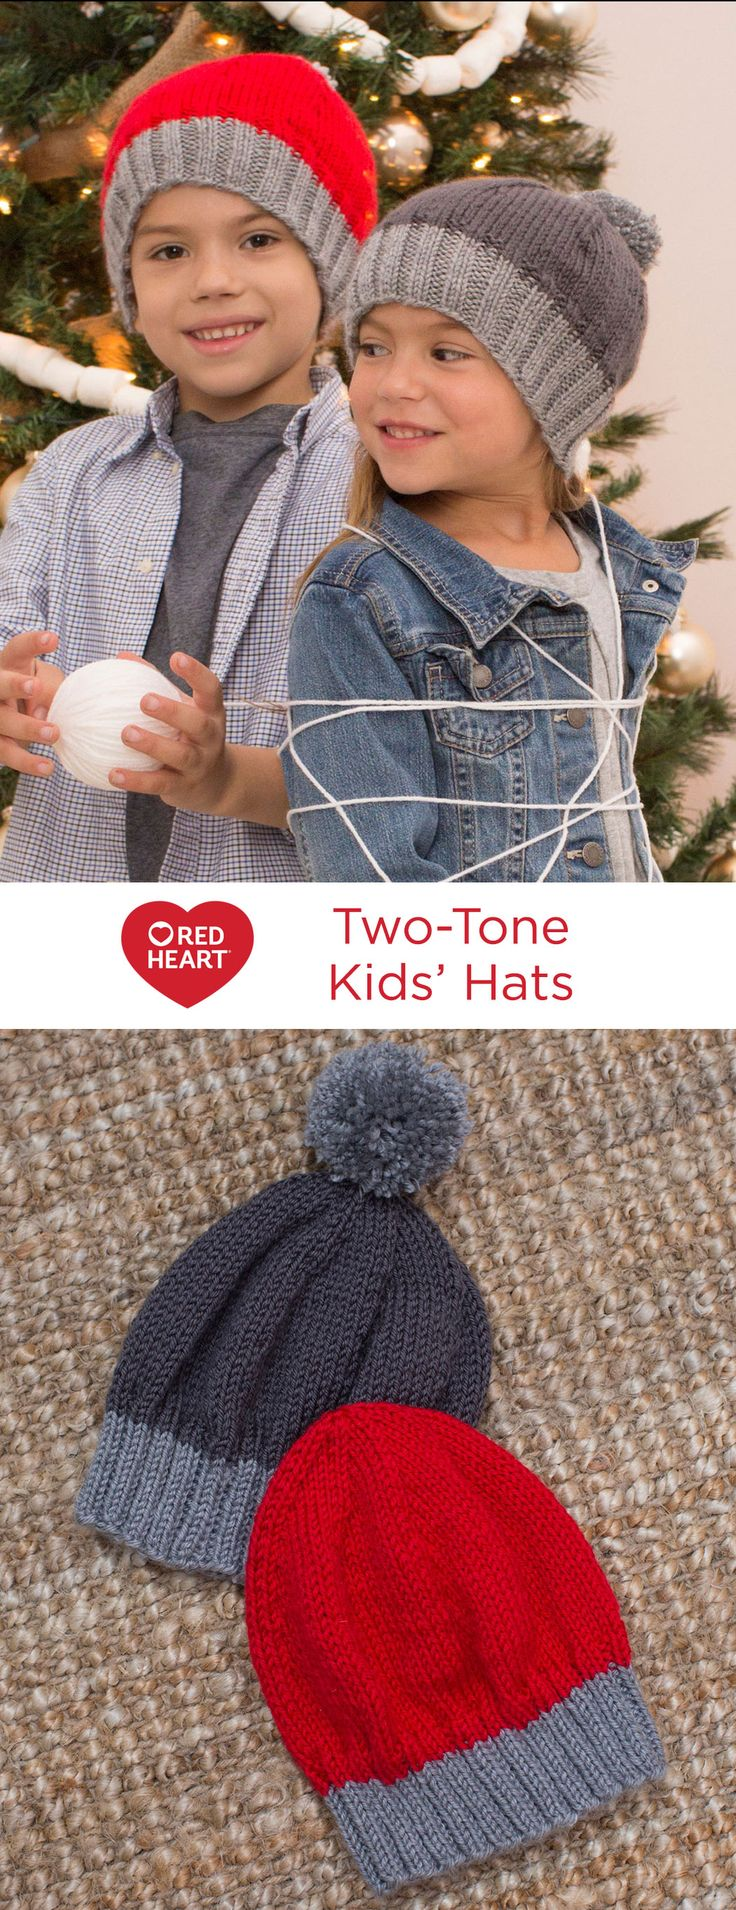 203 best Knitting--Kids Hats images on Pinterest | Crocheted hats ...